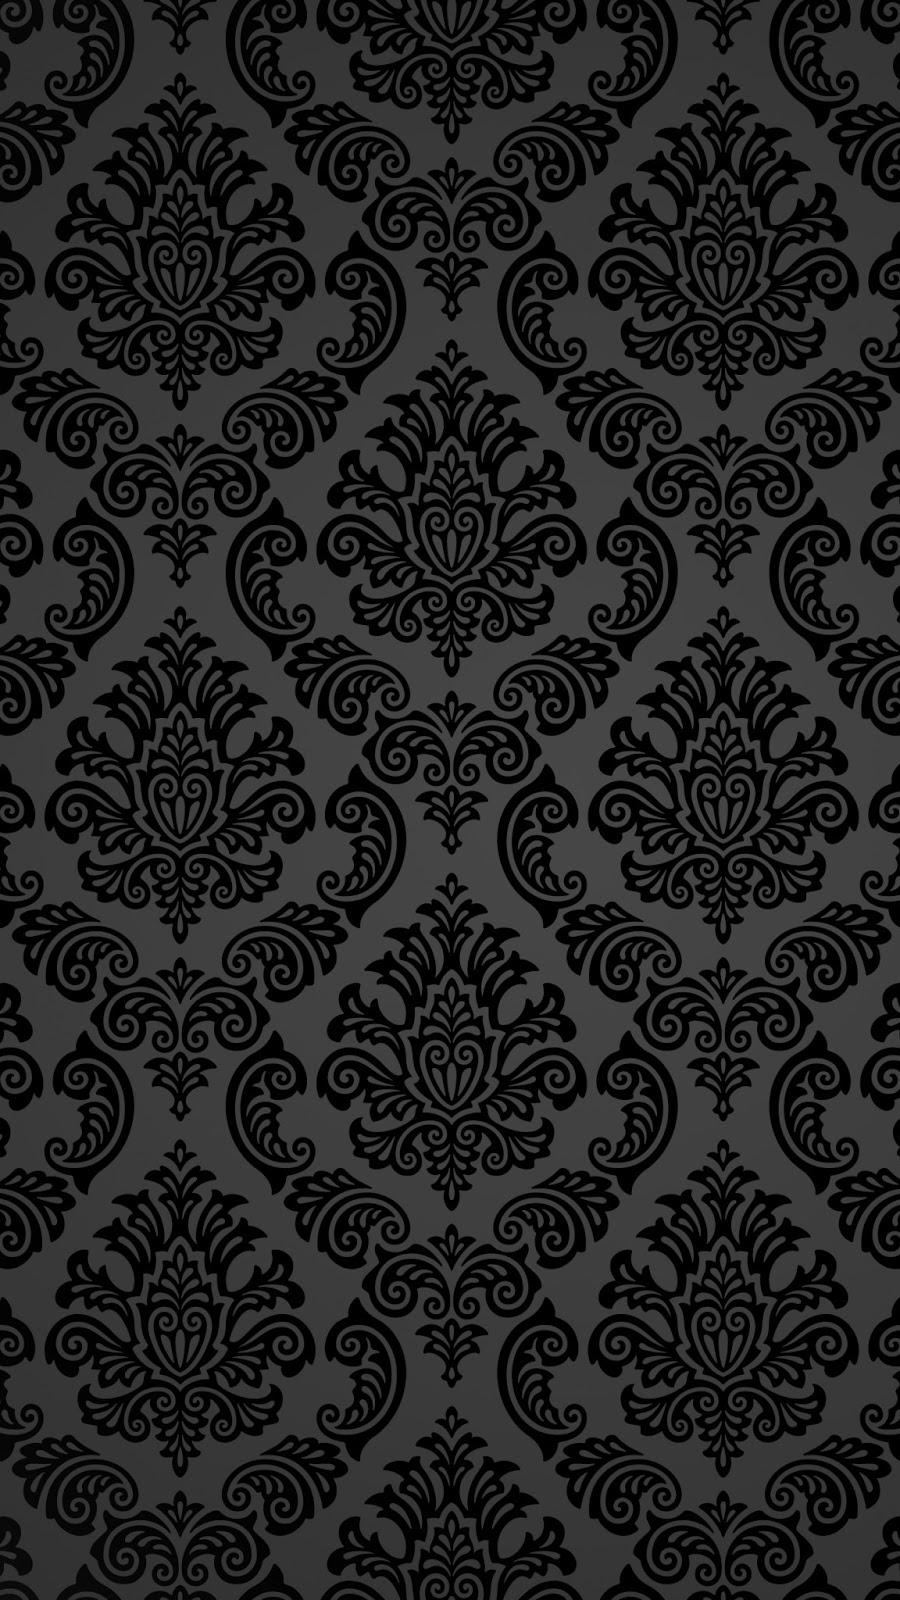 phone wallpaper pattern